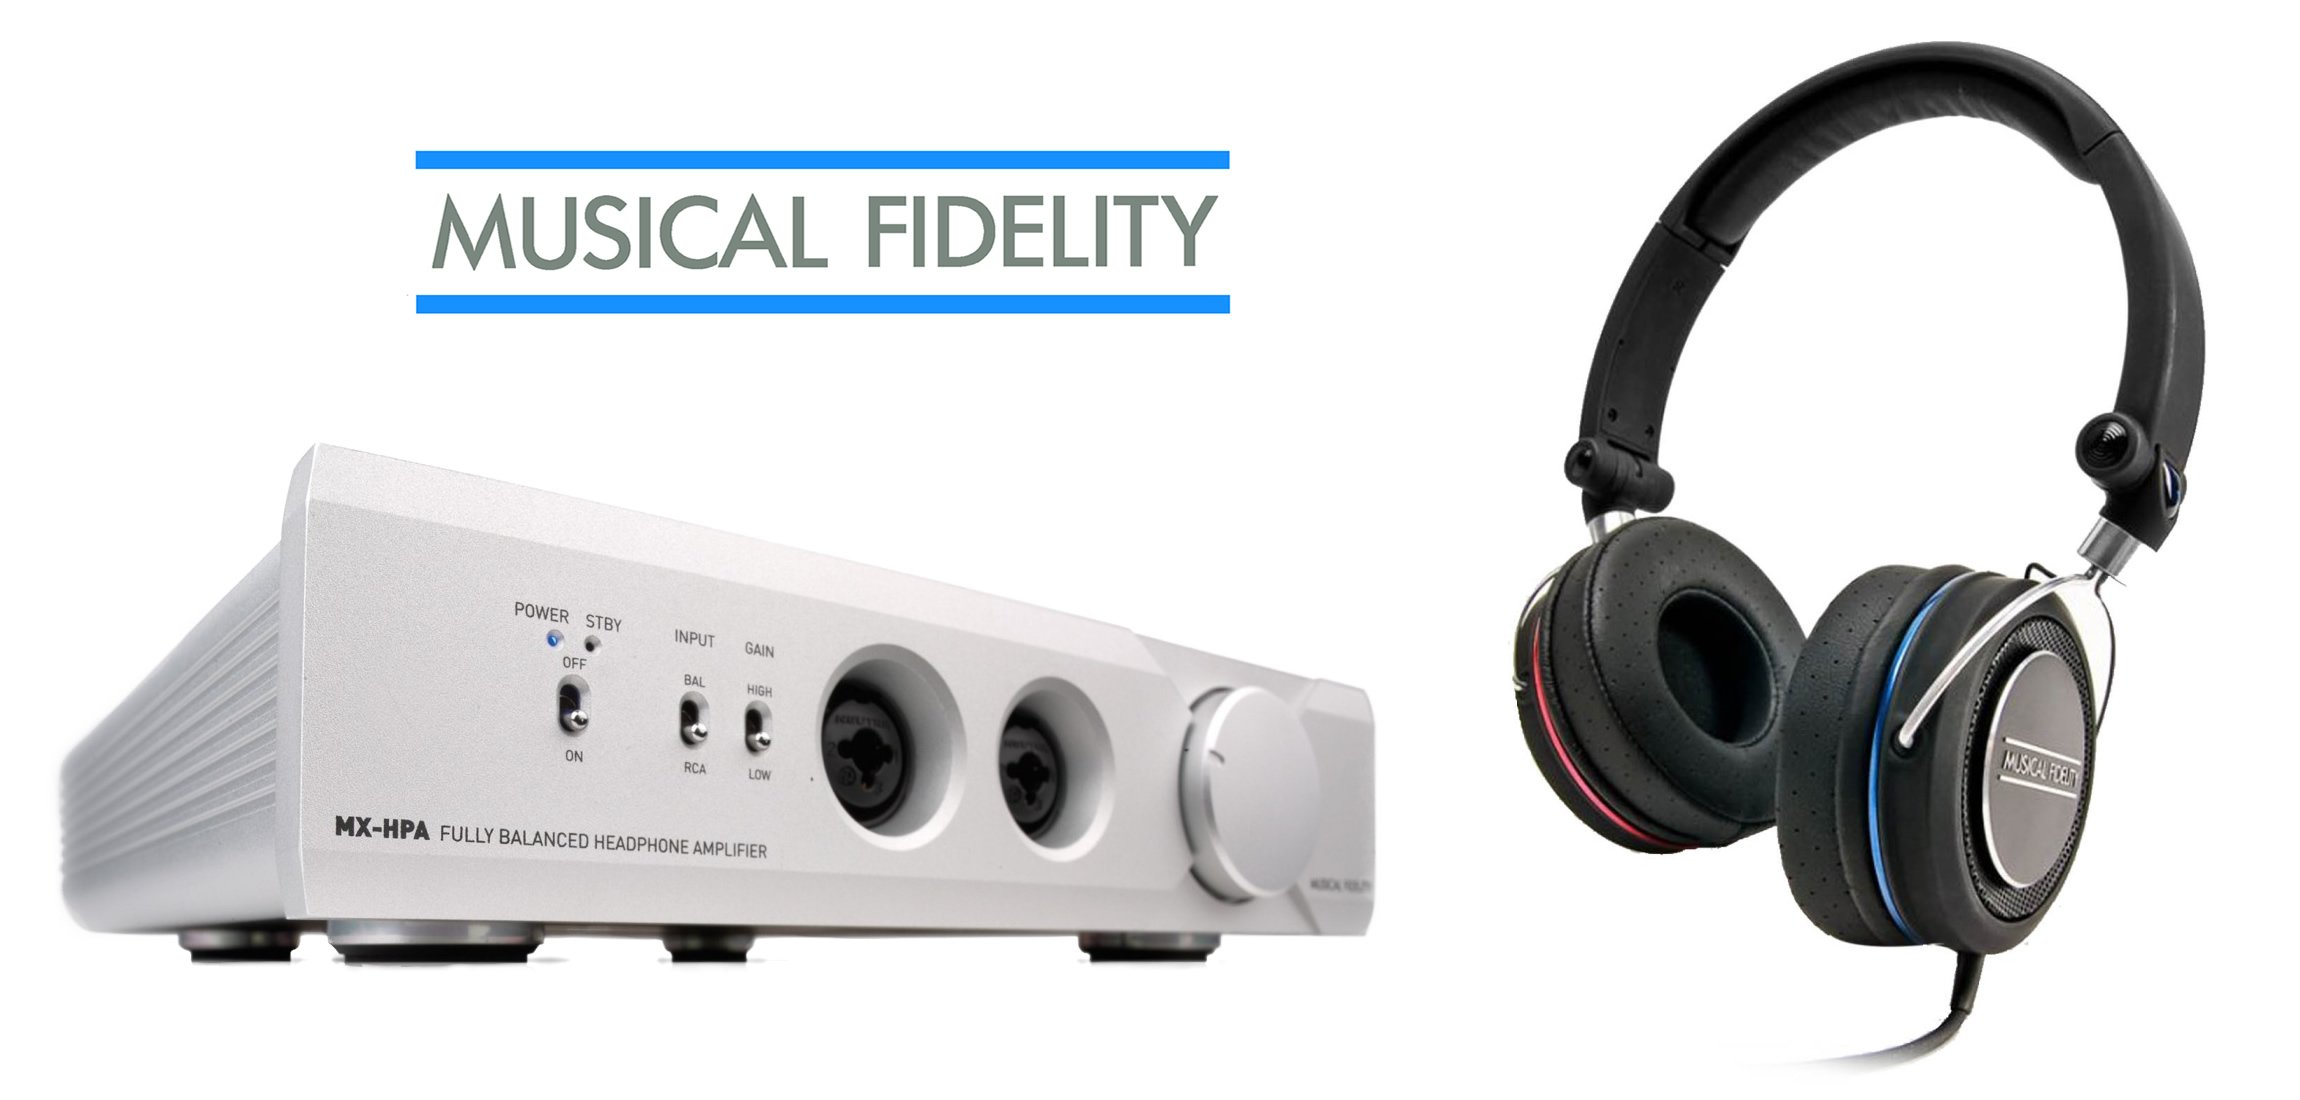 Musical Fidelity Kopfhörer und Kopfhörerverstärker kauft man beim AkustikTune Hifi Studio